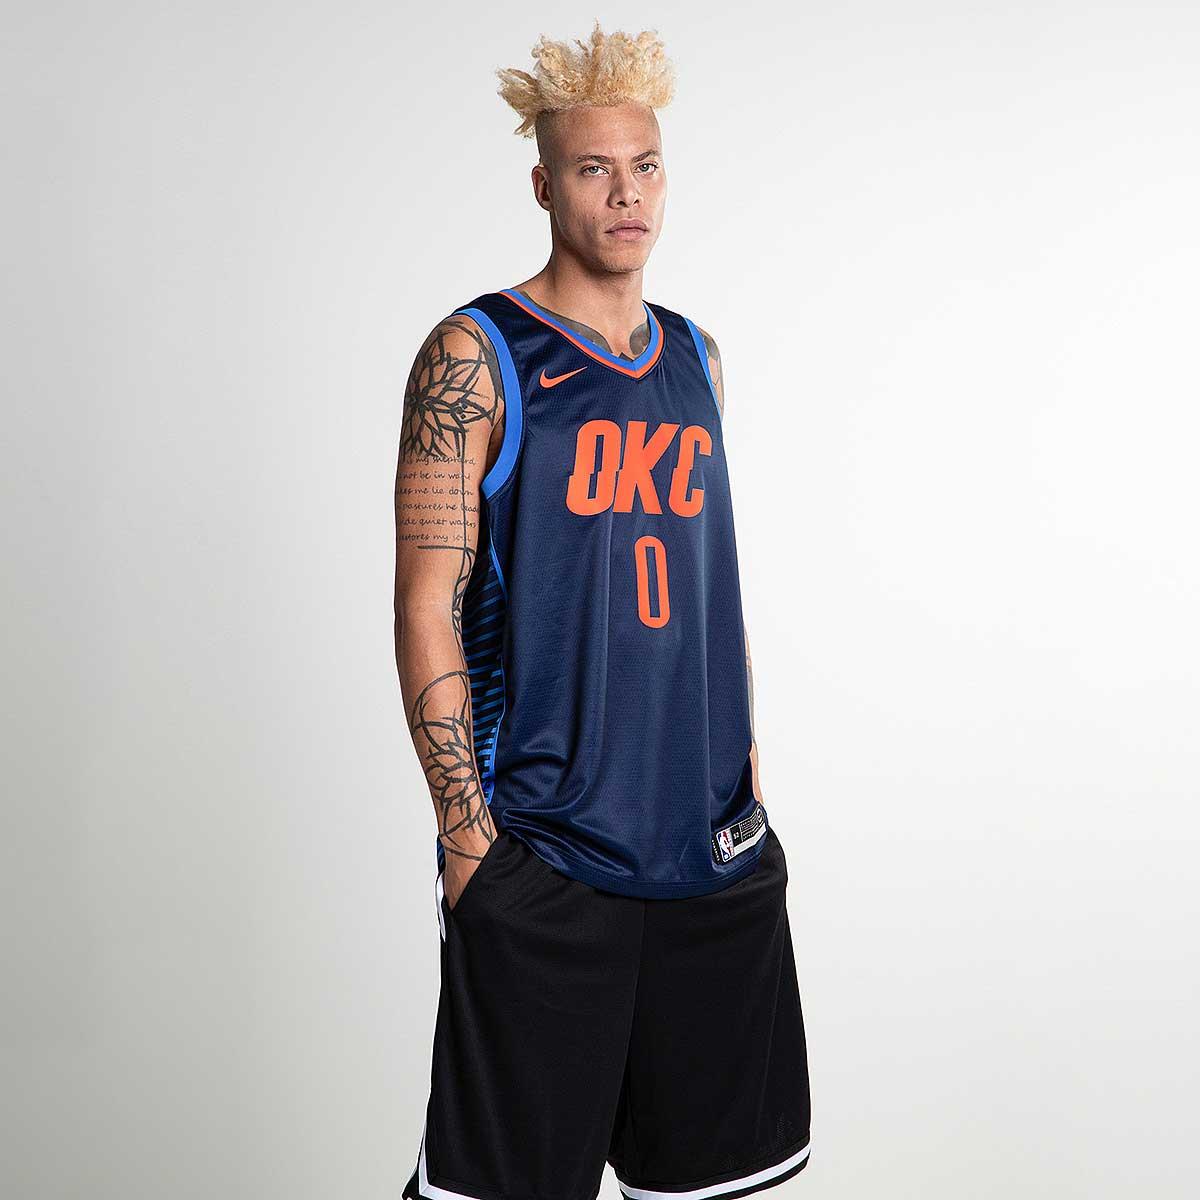 93ecba9ffee7 Nike NBA Oklahoma City Thunder Russell Westbrook Statement Edition Swingman  Jersey - NBA Shop OKC Thunder Merchandise - Superfanas.lt